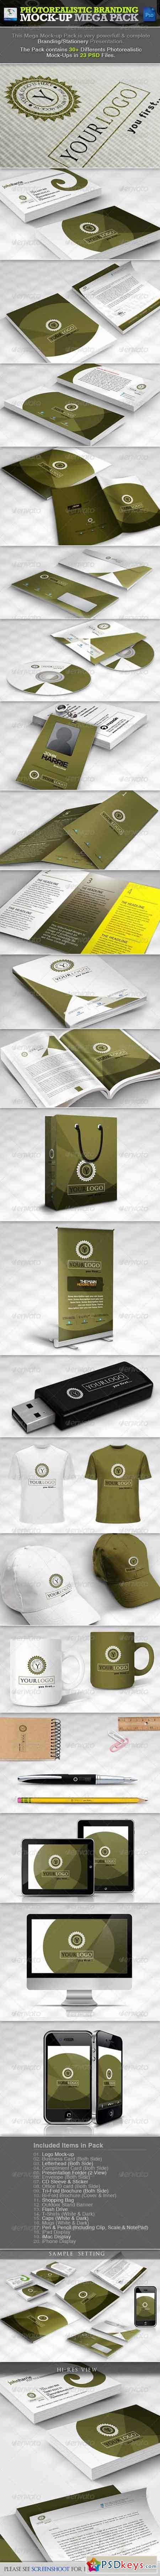 Photorealistic Branding Mock-up Mega Pack 3359729